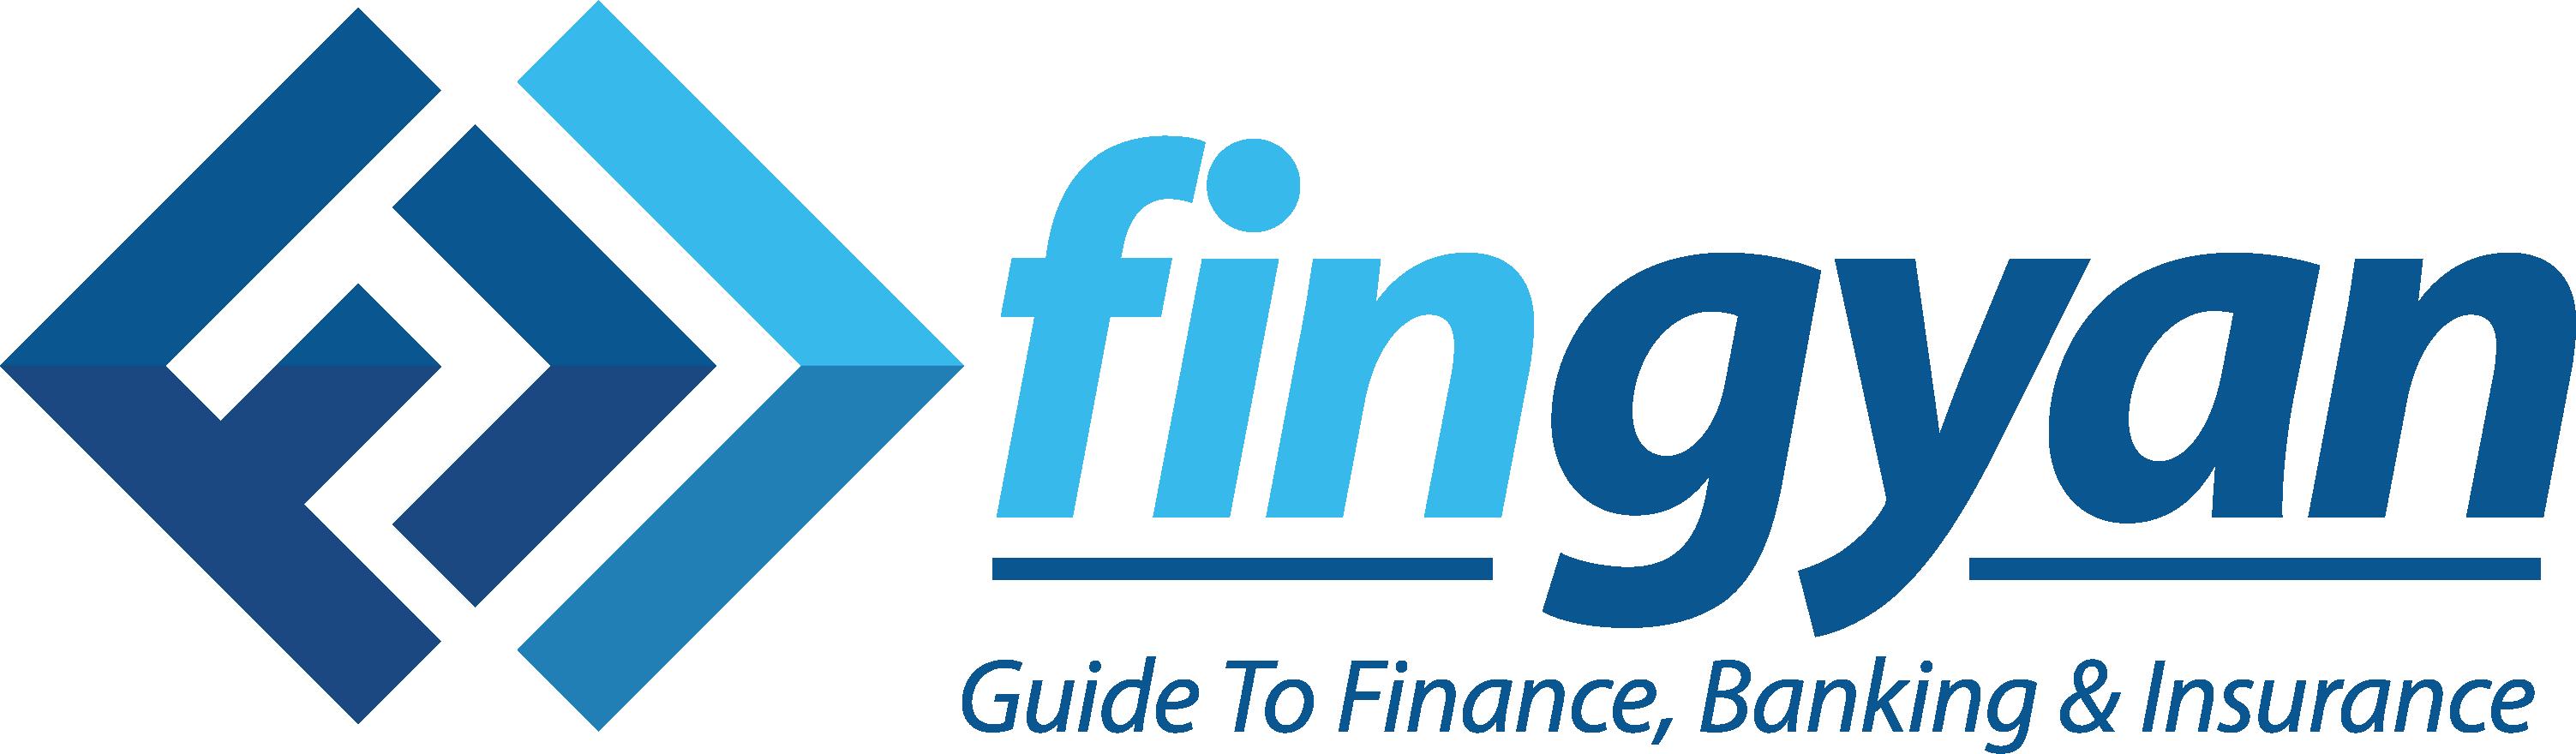 Fingyan.com